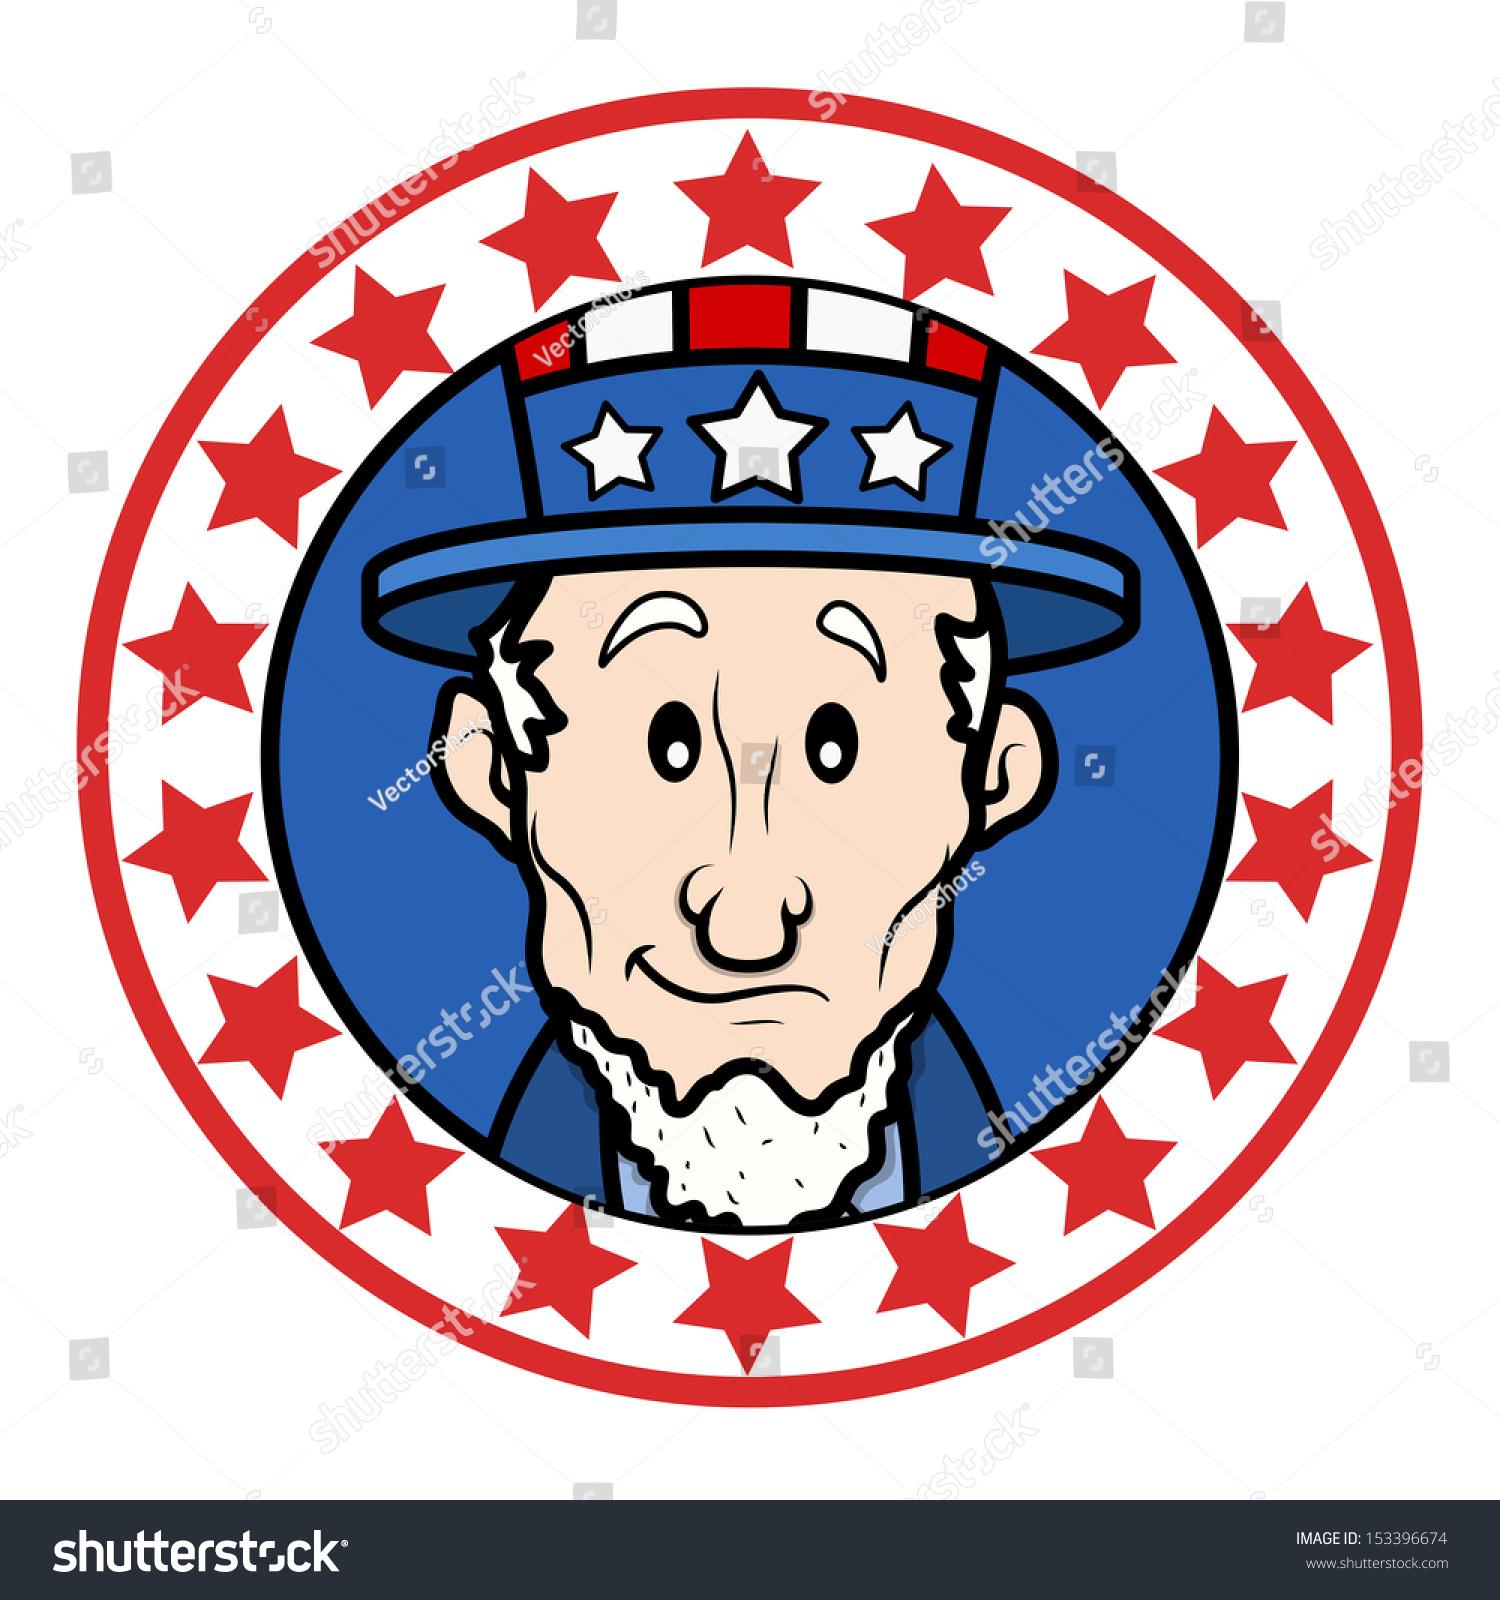 Patriotic Usa Theme Circular Design With Abraham Lincoln Wearing